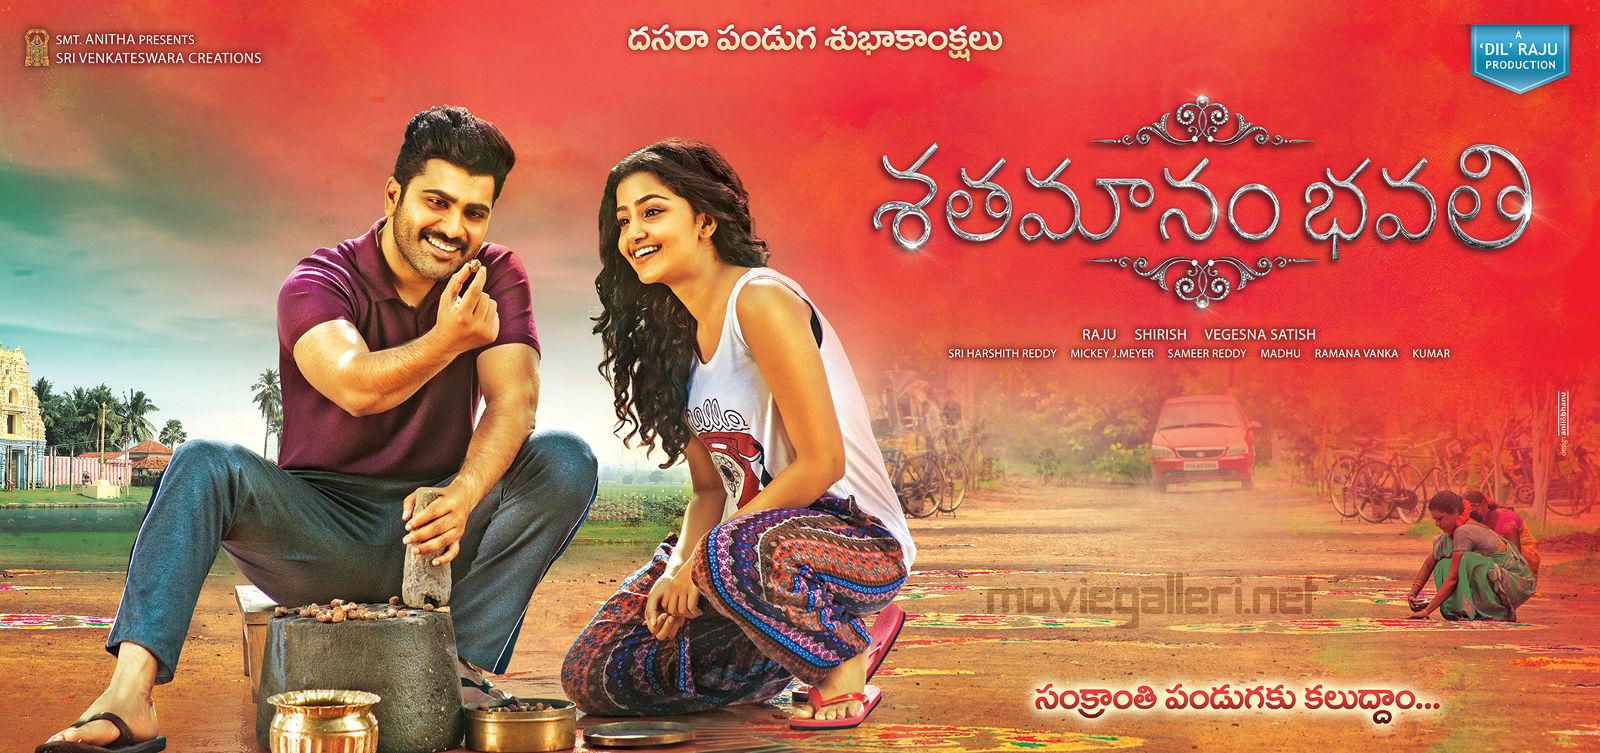 Shatamanam Bhavati Movie First Look Wallpaper New Movie Posters